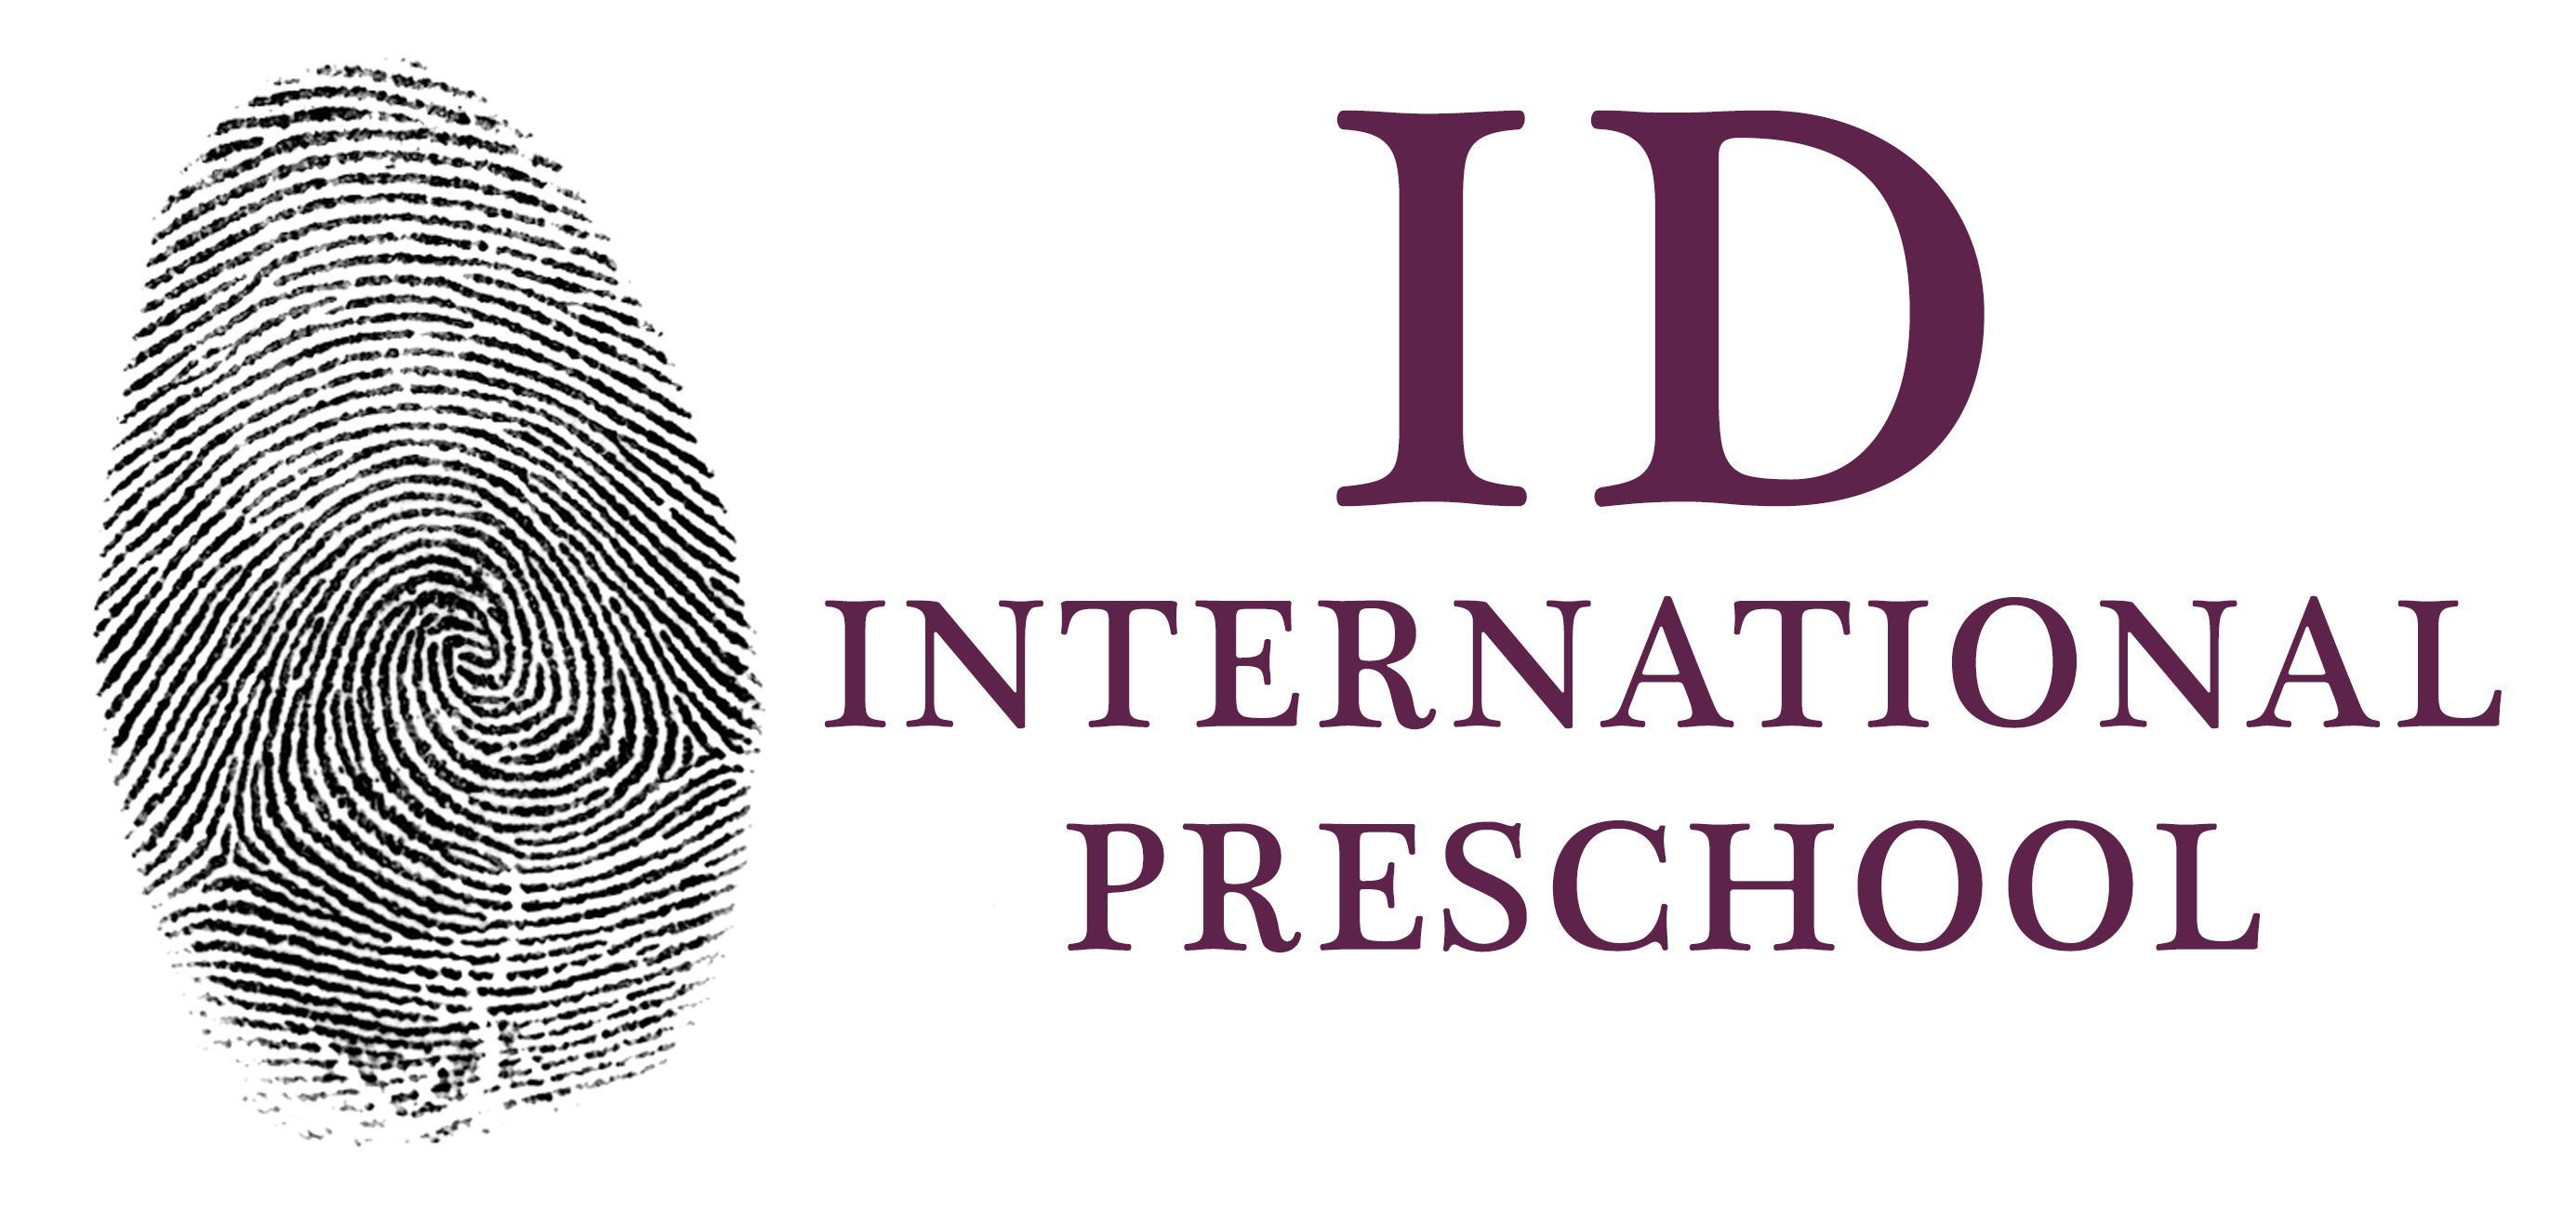 ID International Preschool, Id International Preschool